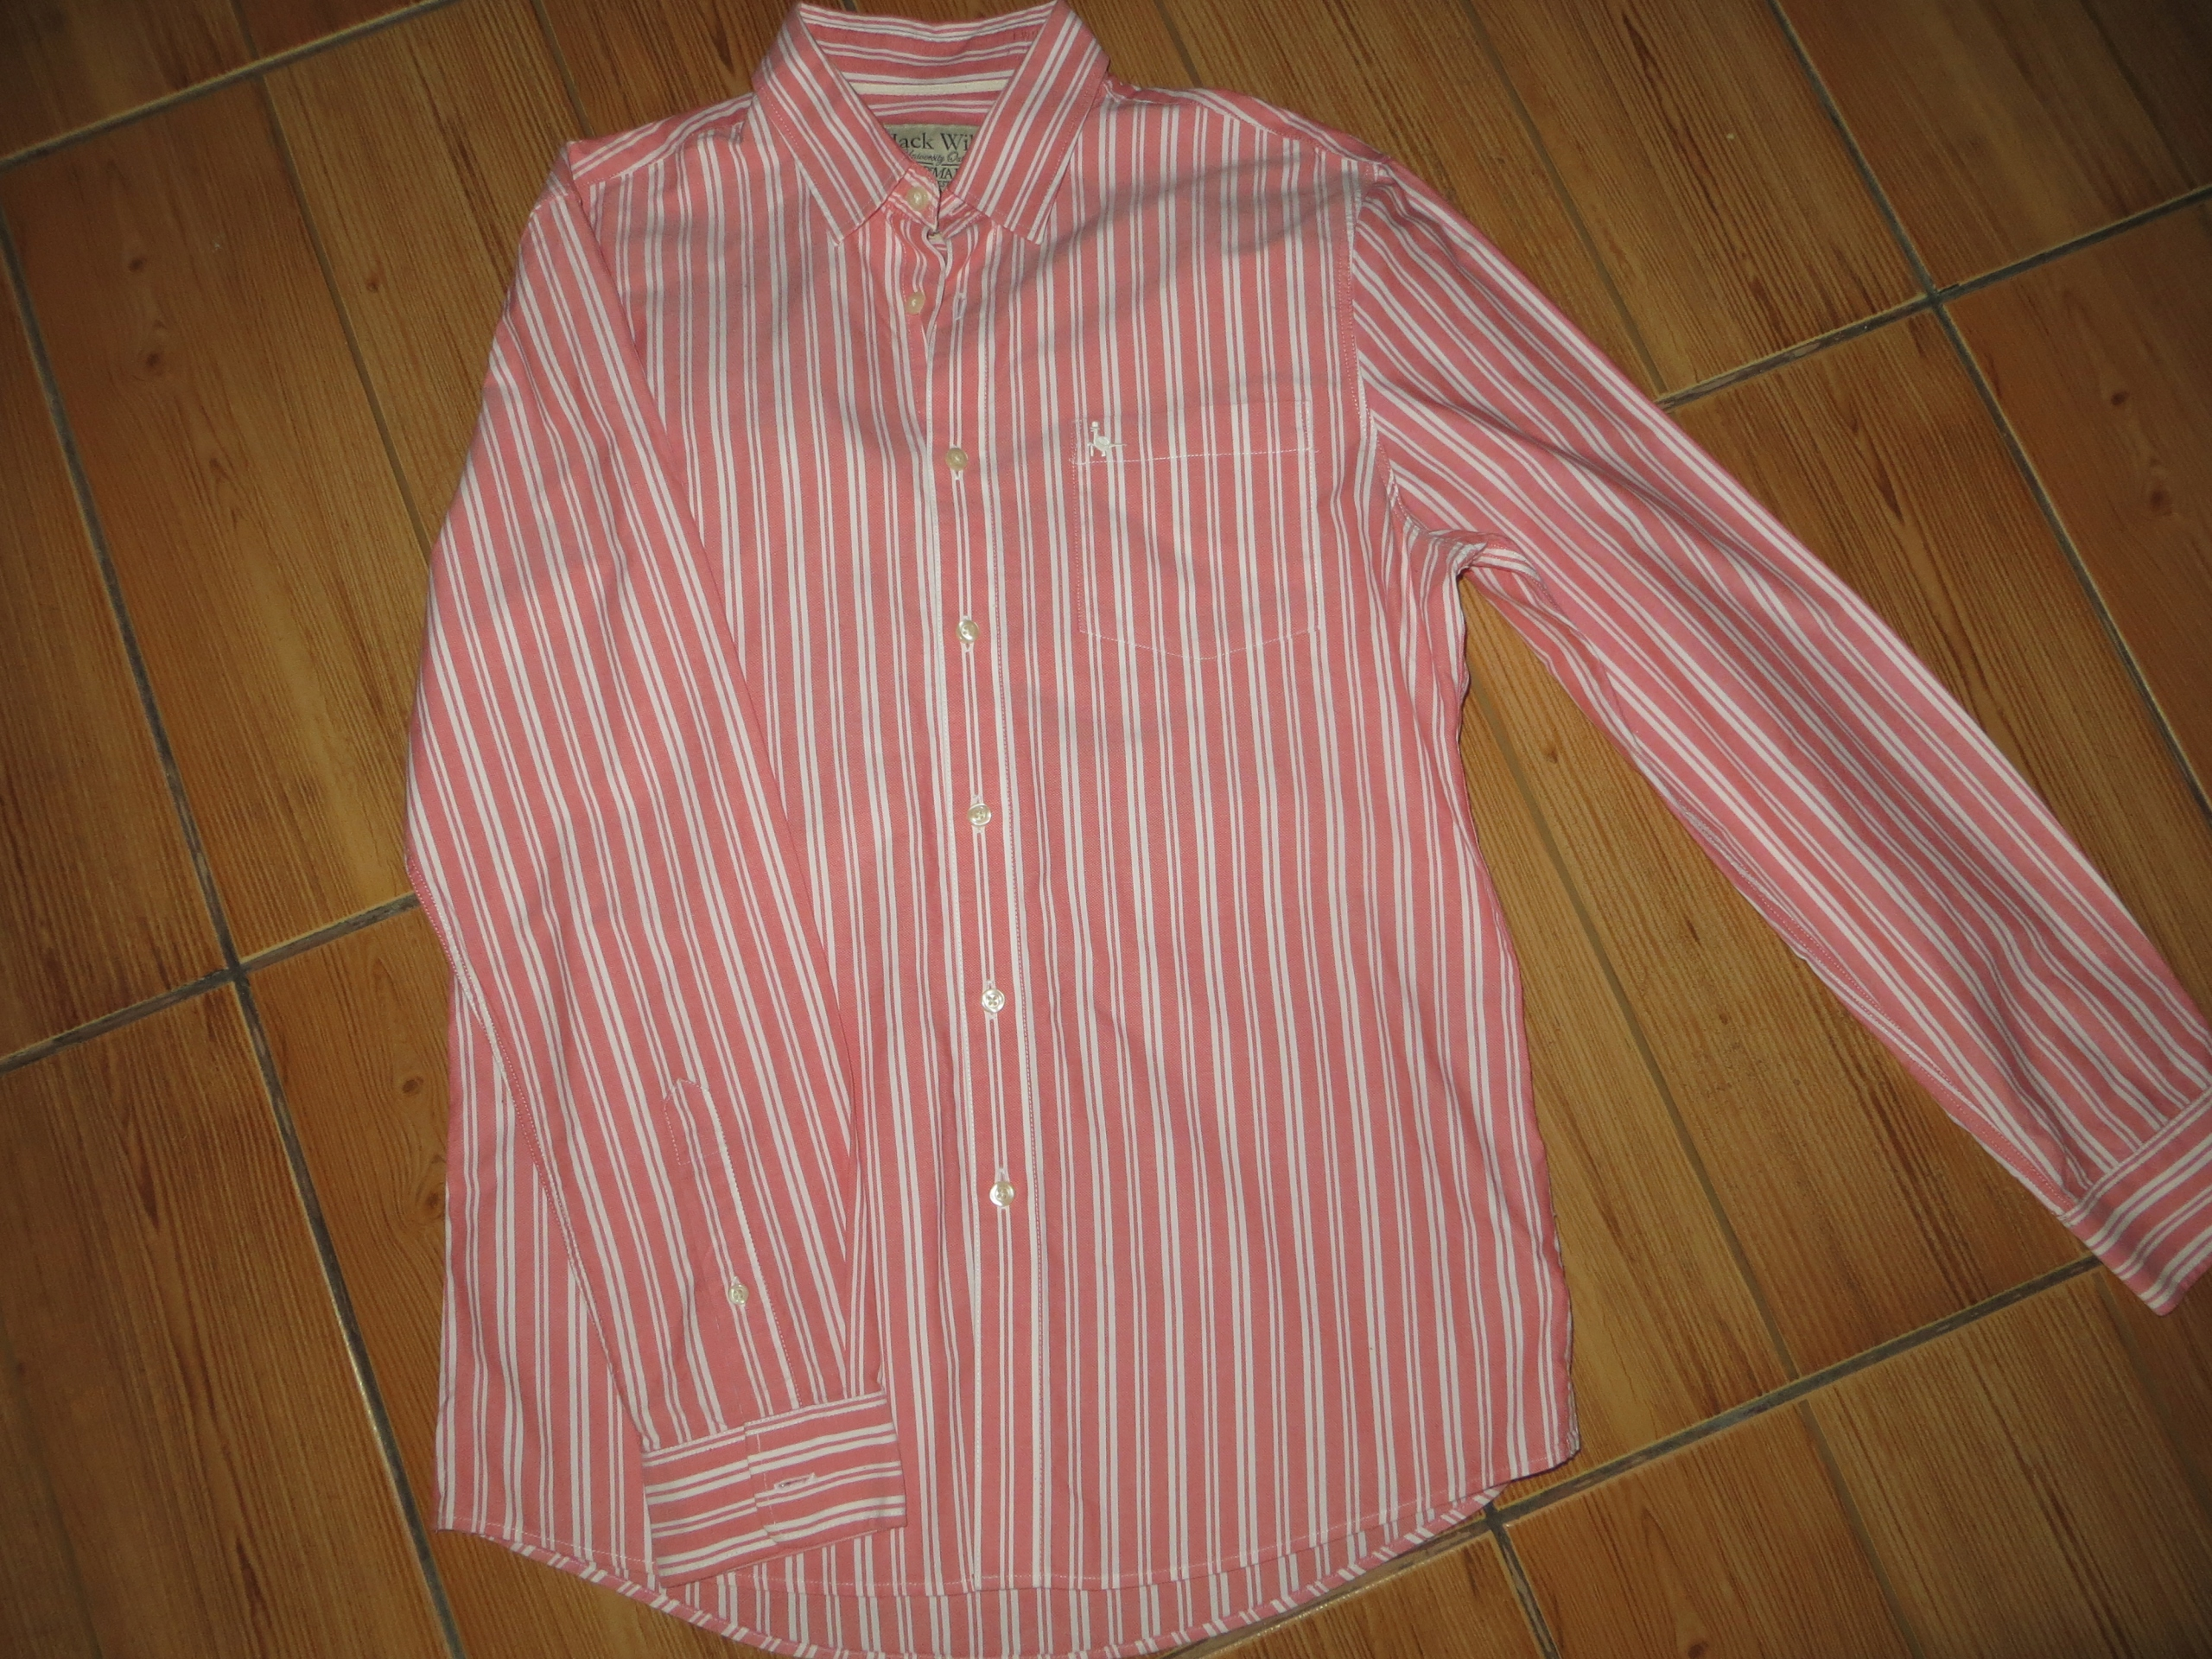 Koszula męska JACK WILLS rozmiar M